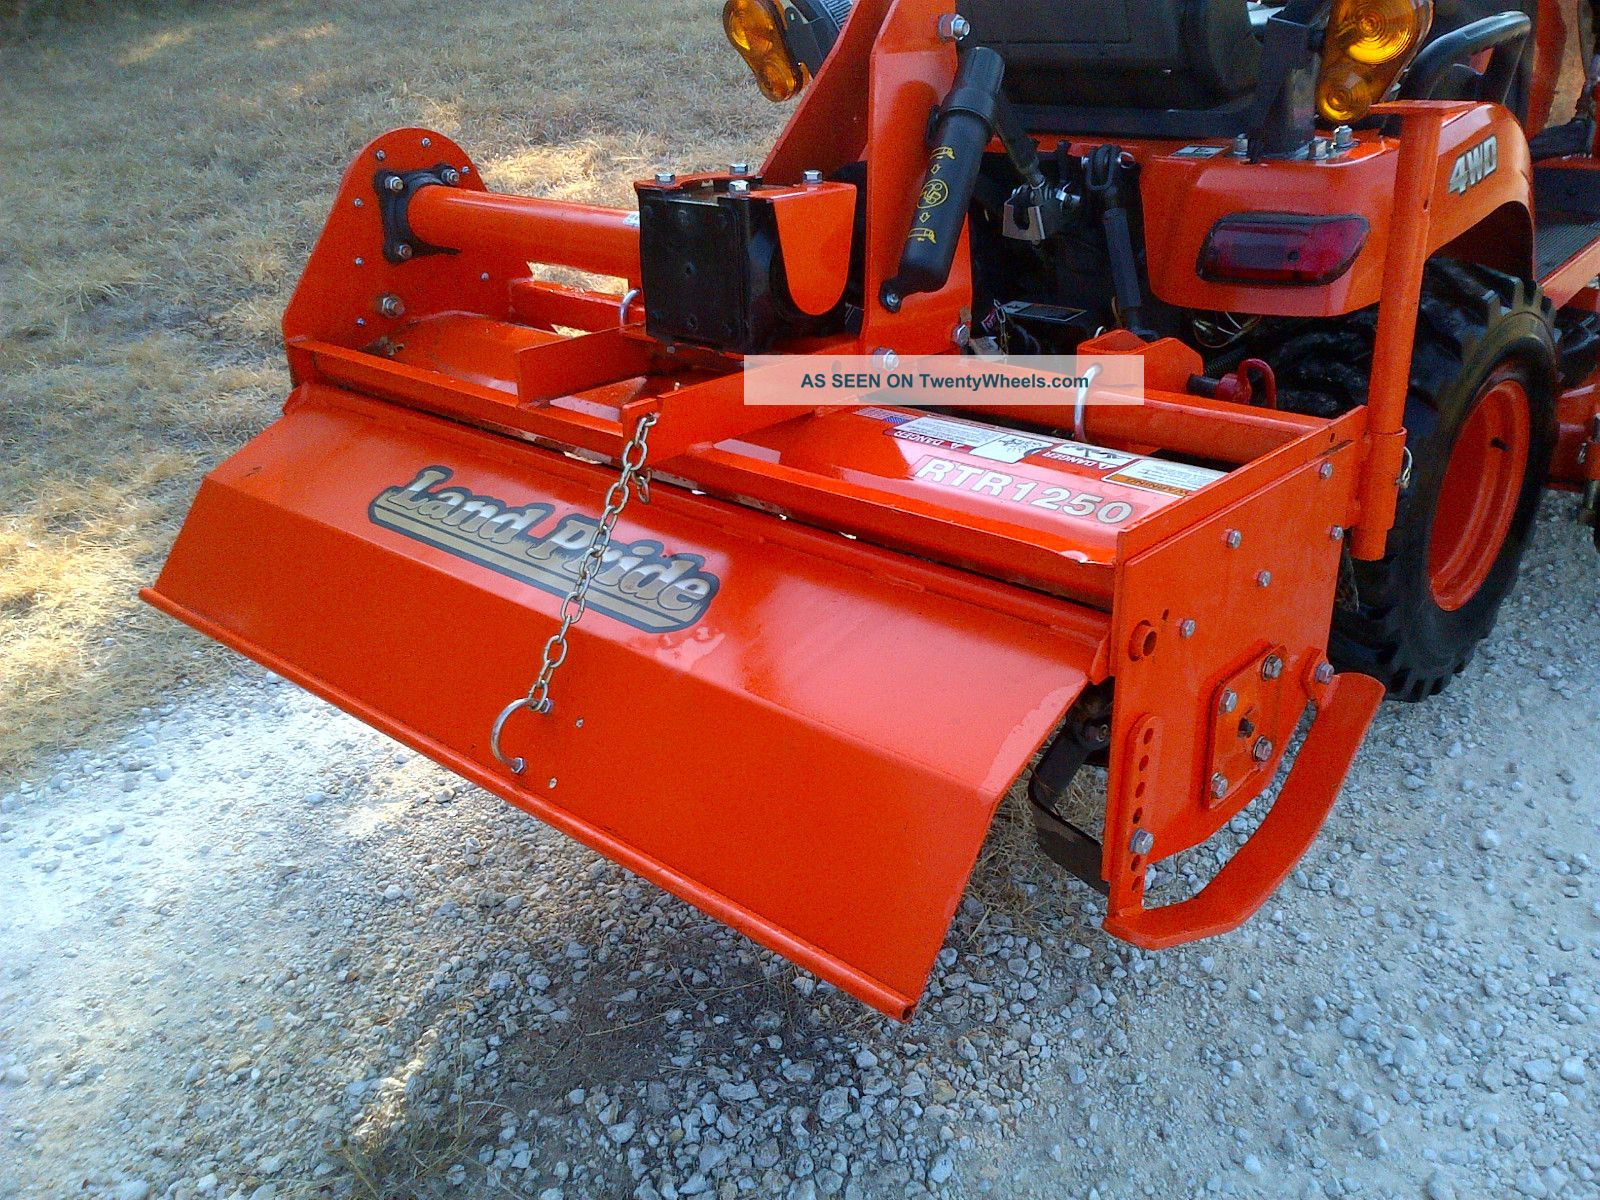 Kubota Tractor W Tiller Mower And Front Loader Lgw